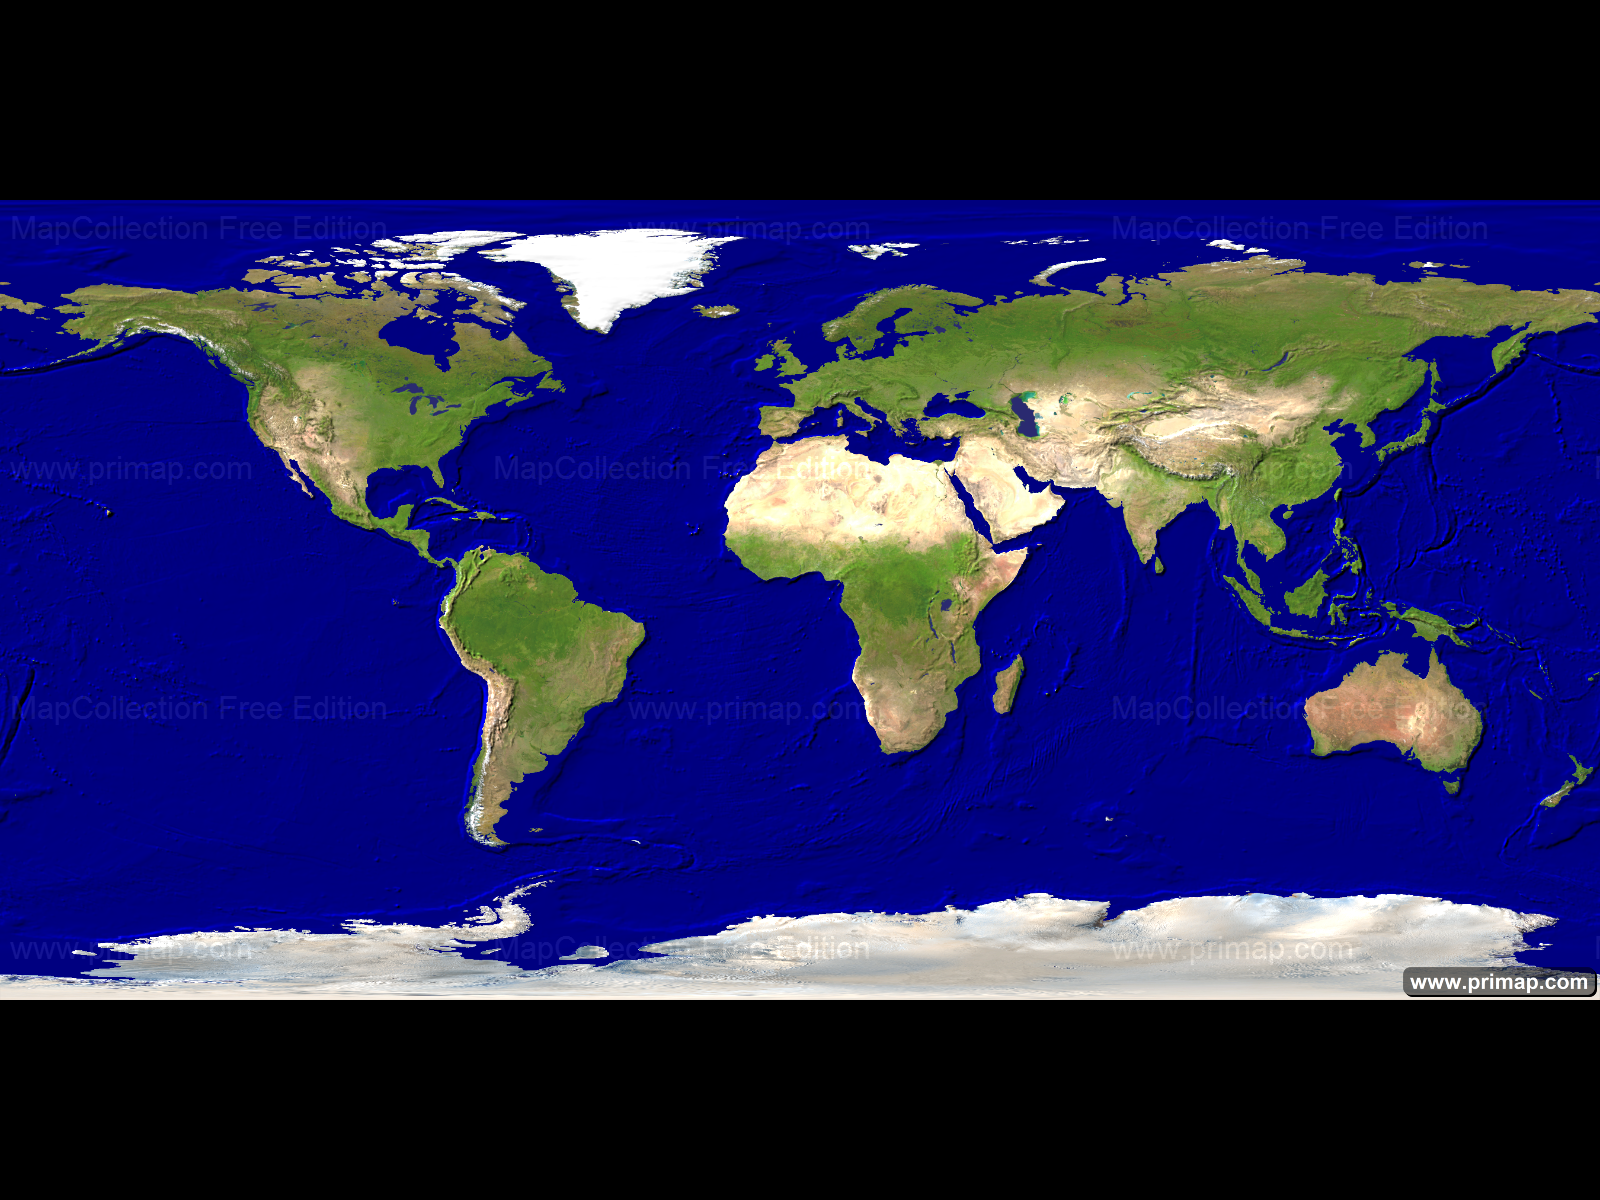 Primap World Maps - World map satellite picture